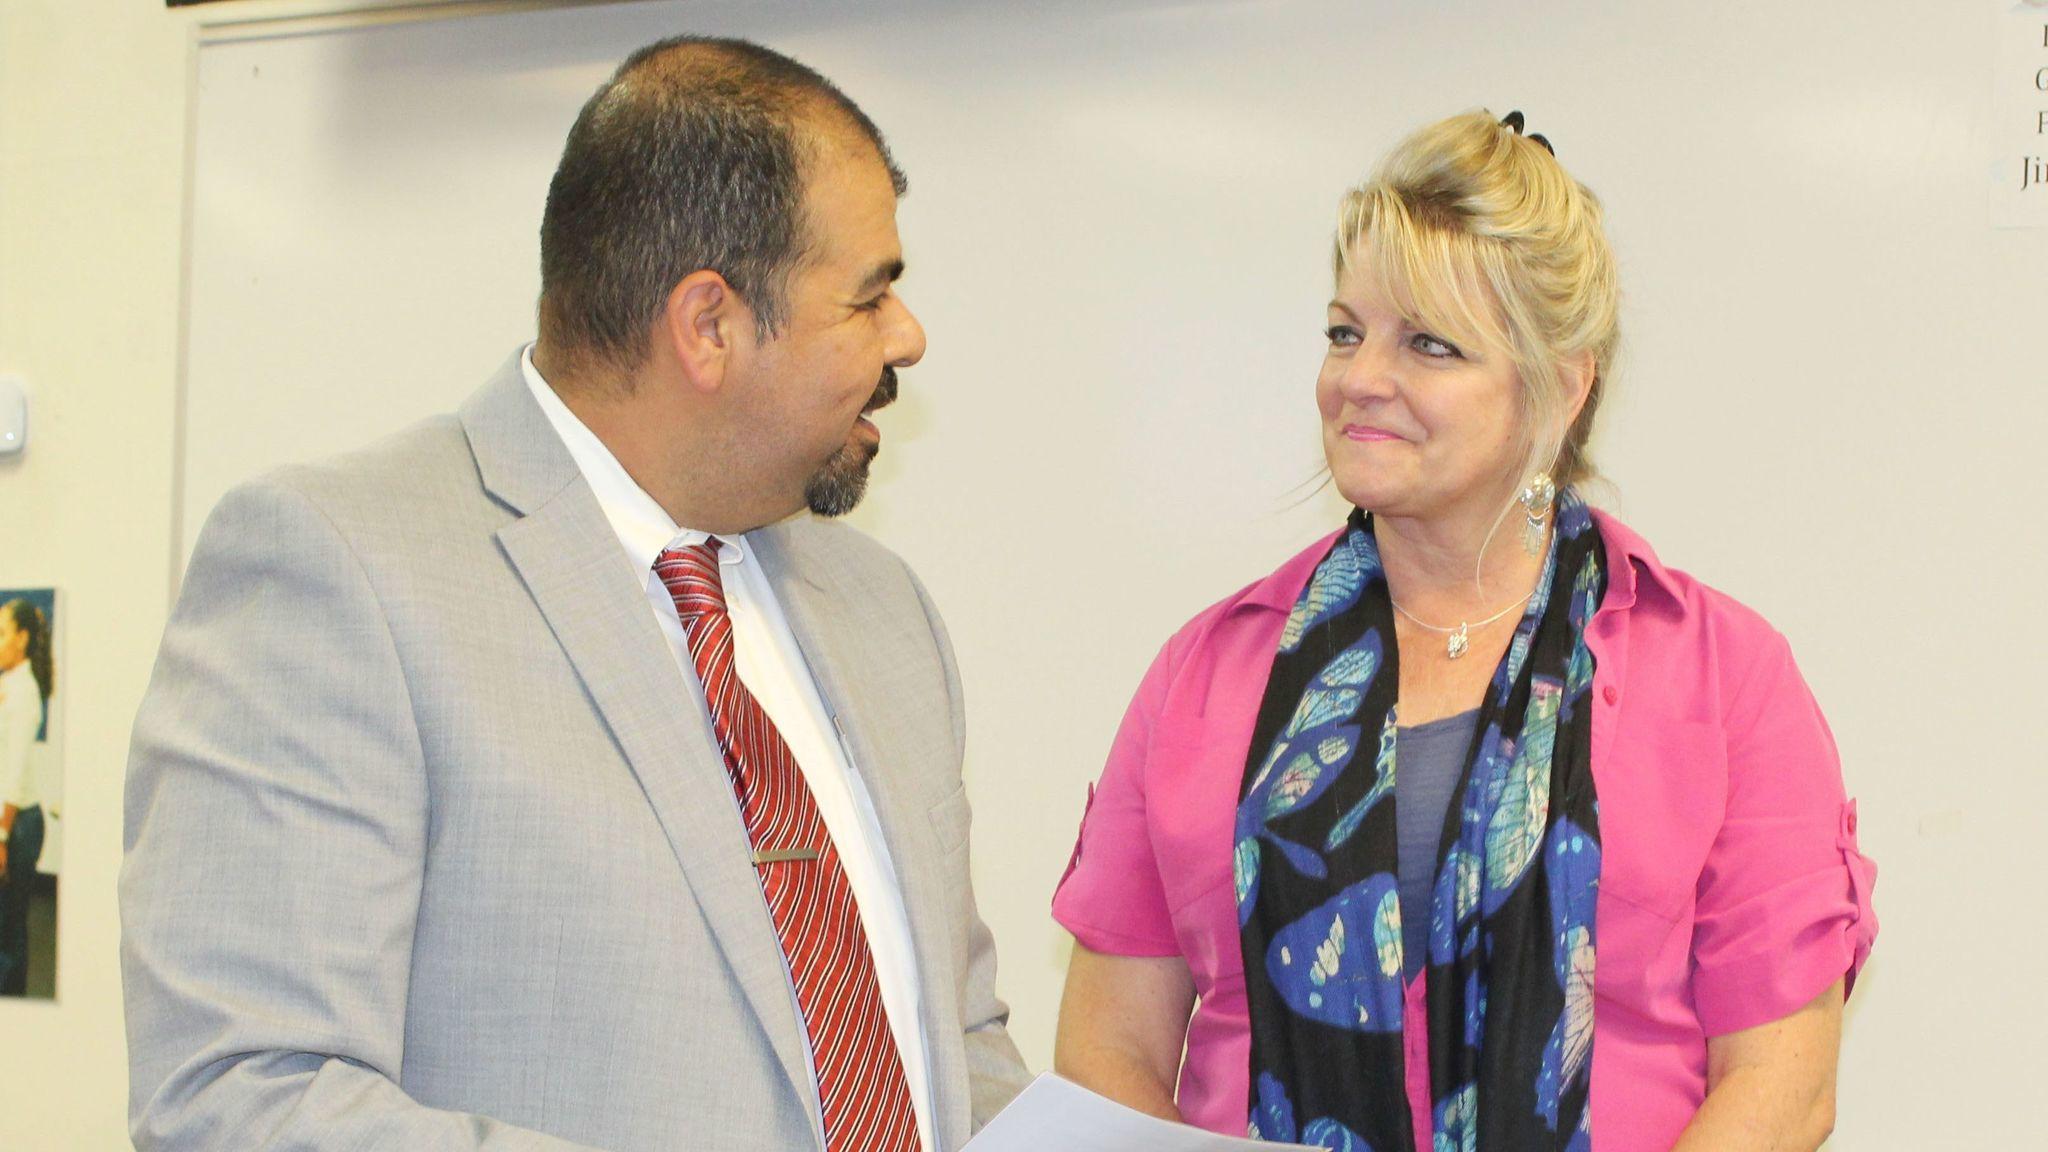 Assistant Superintendent of Human Resources Joel Garcia congratulates teacher Karin Yuhl on her retirement.